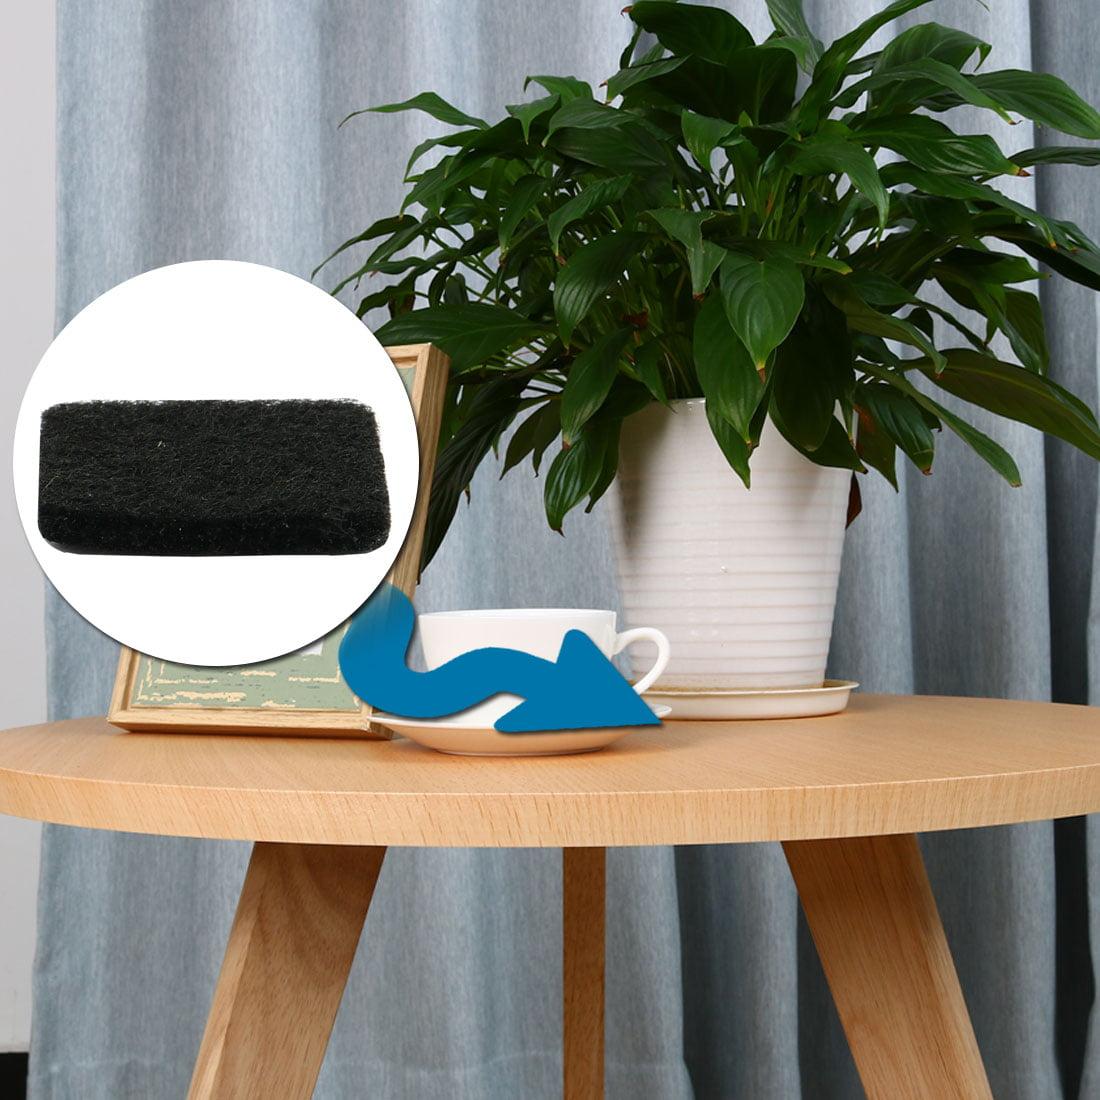 Furniture Rubber Square Feet Antiskid Adhesive Pad Floor Protector Black 64pcs - image 1 of 3